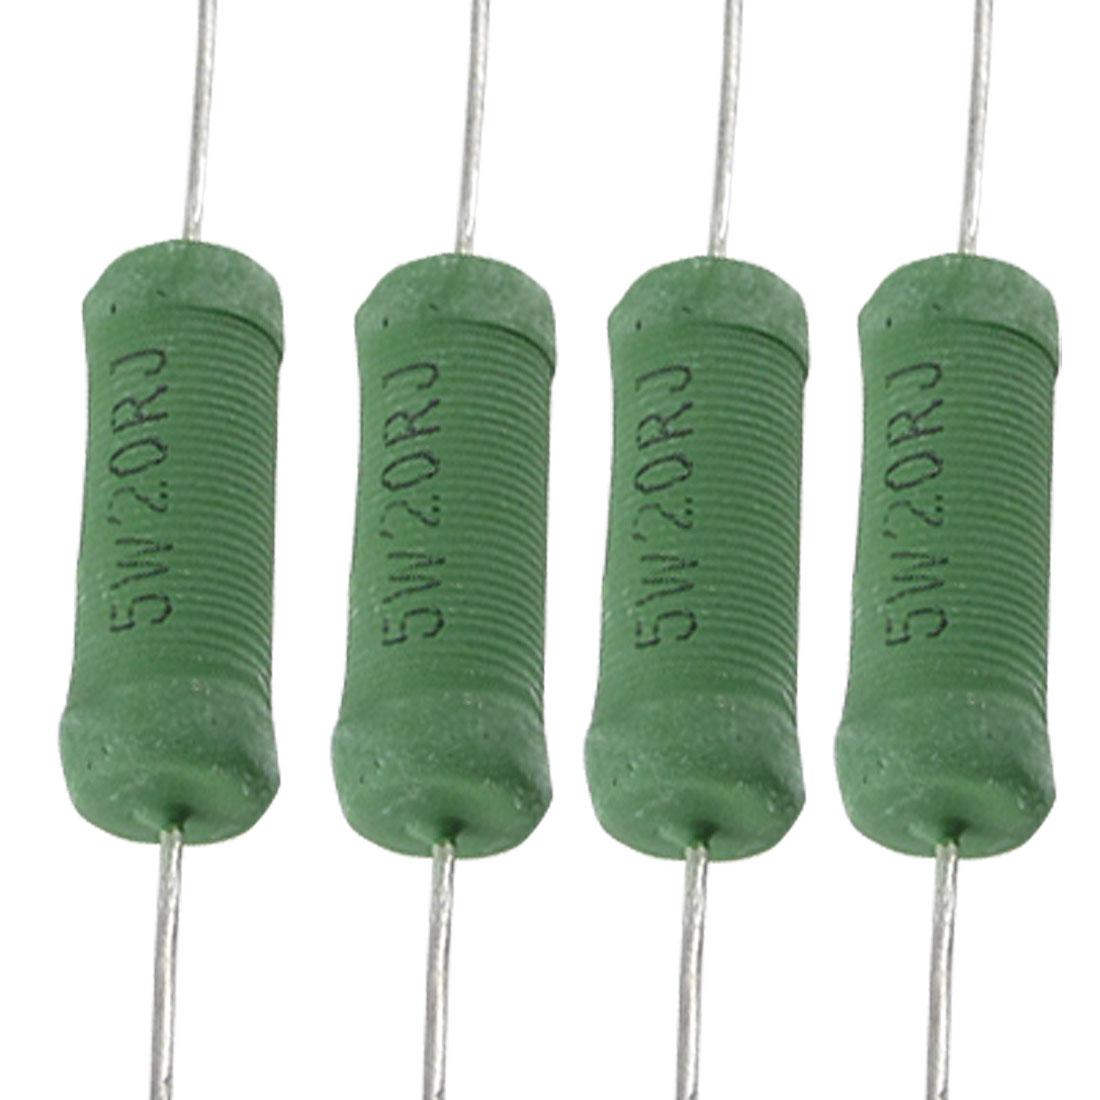 Axial Lead 5W 20 Ohm Ceramic Wirewound Resistor R 10 Pcs